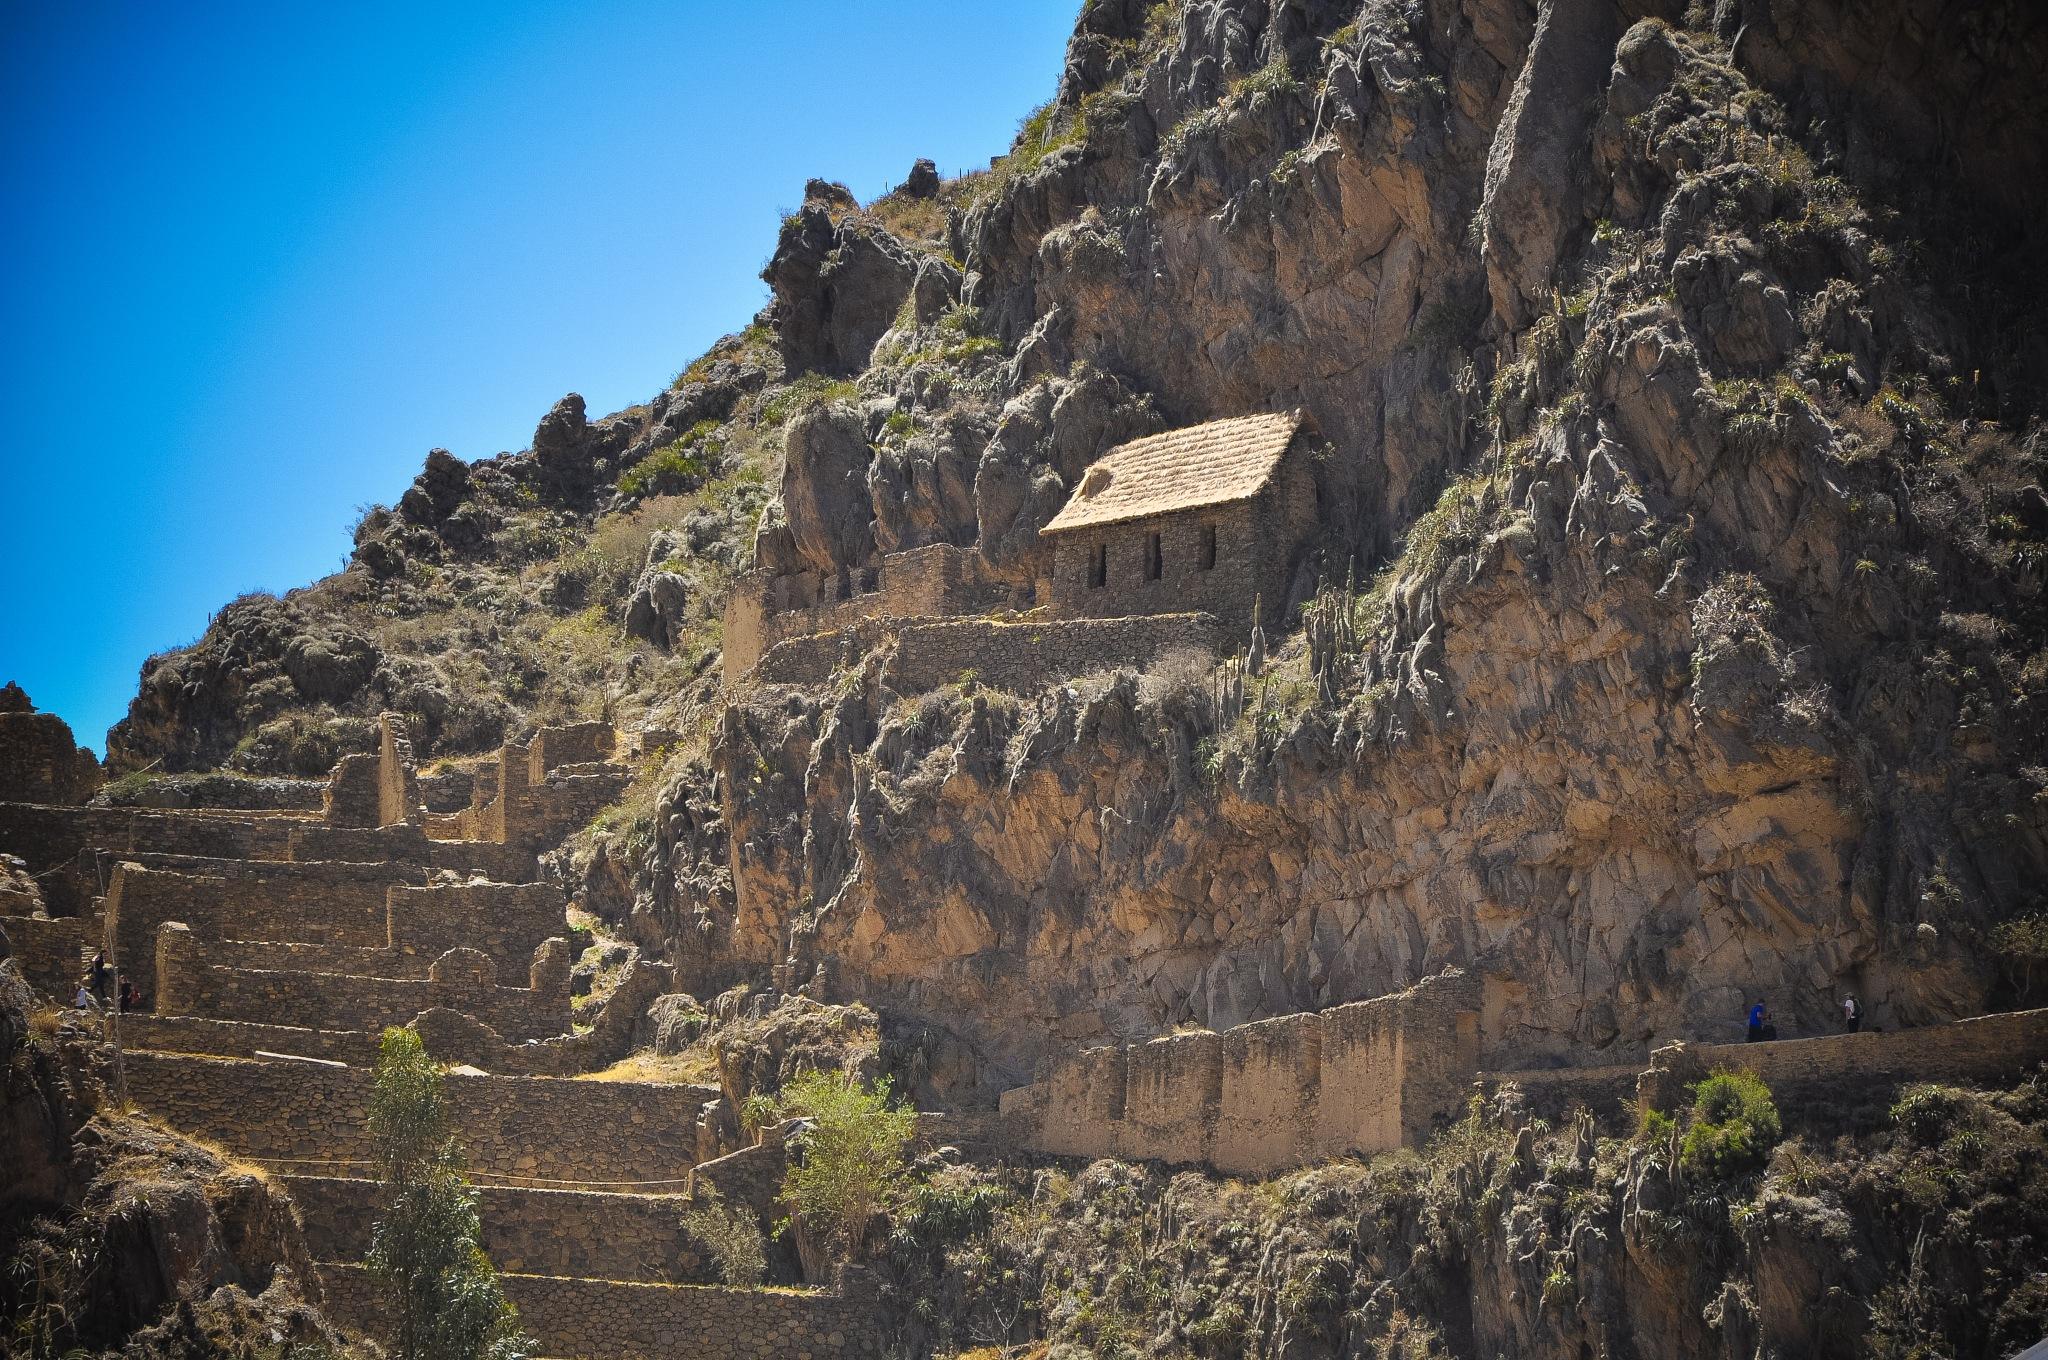 The Ollantaytambo Inca Ruins (Peru) by Jiri Bielicky